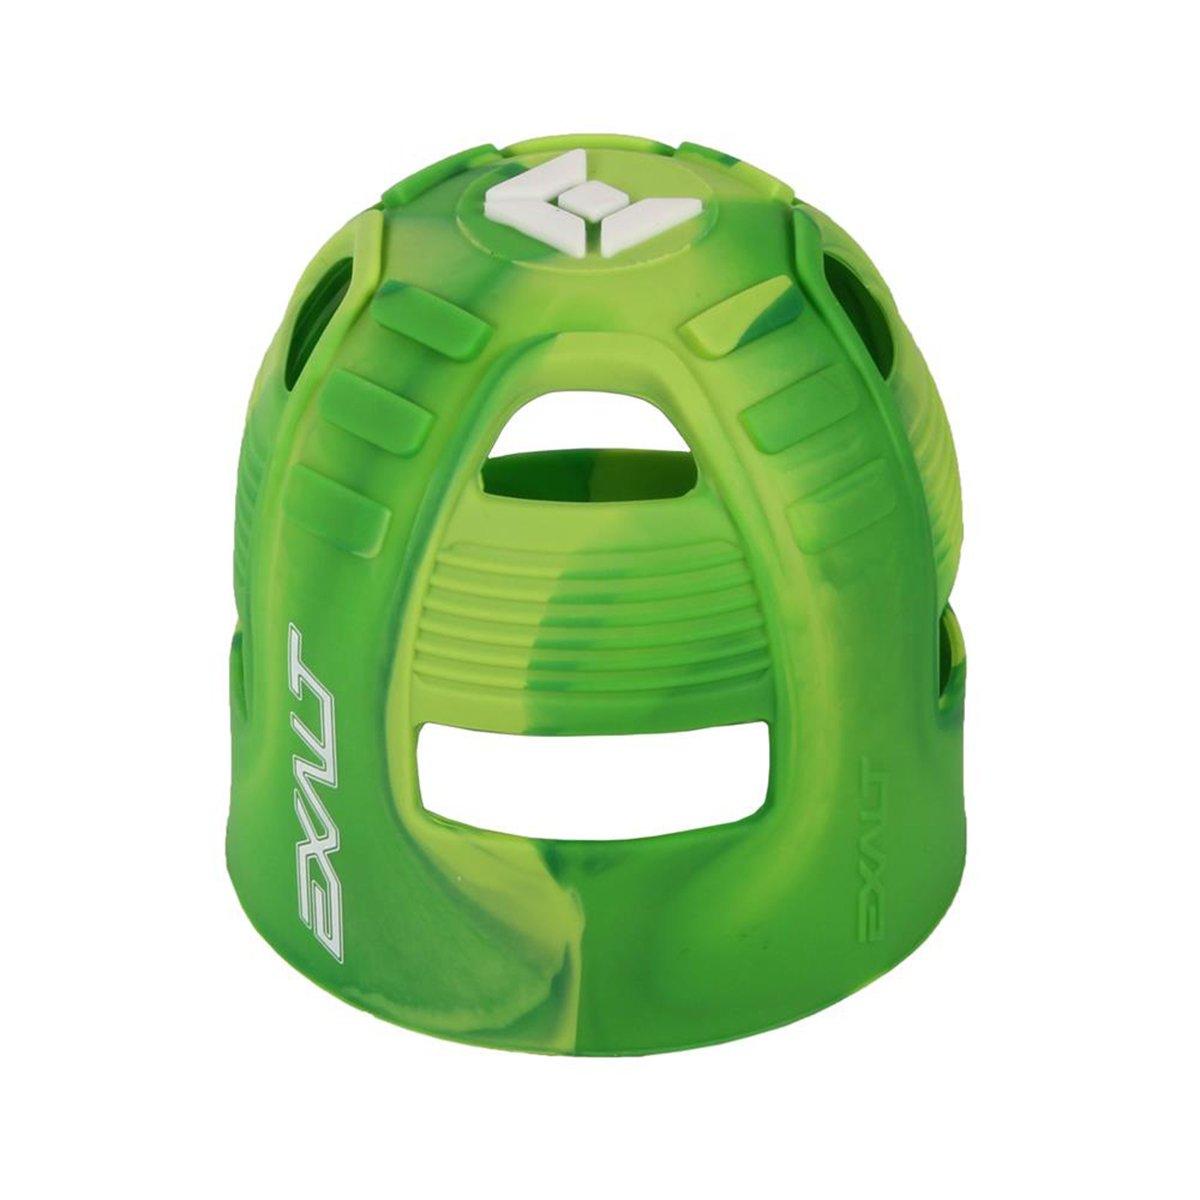 Exalt Paintball Tank Grip - 45-88ci - Lime Swirl by Exalt